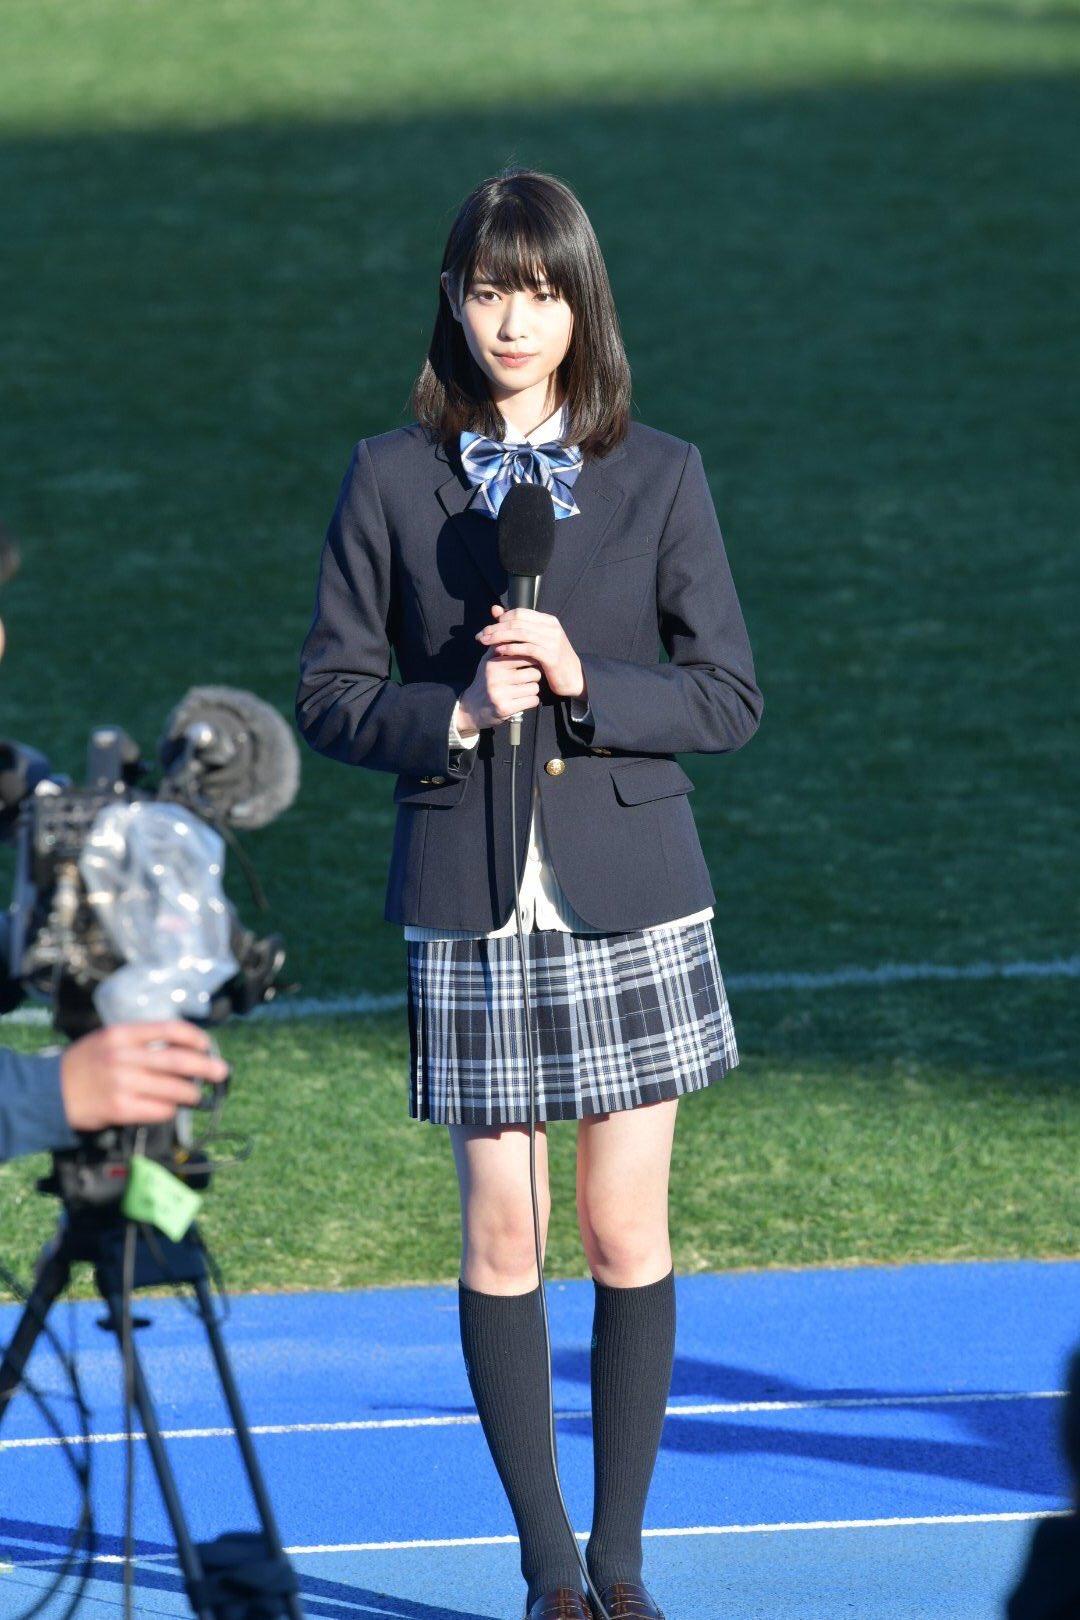 AUTOAKB48&FC Tokyo